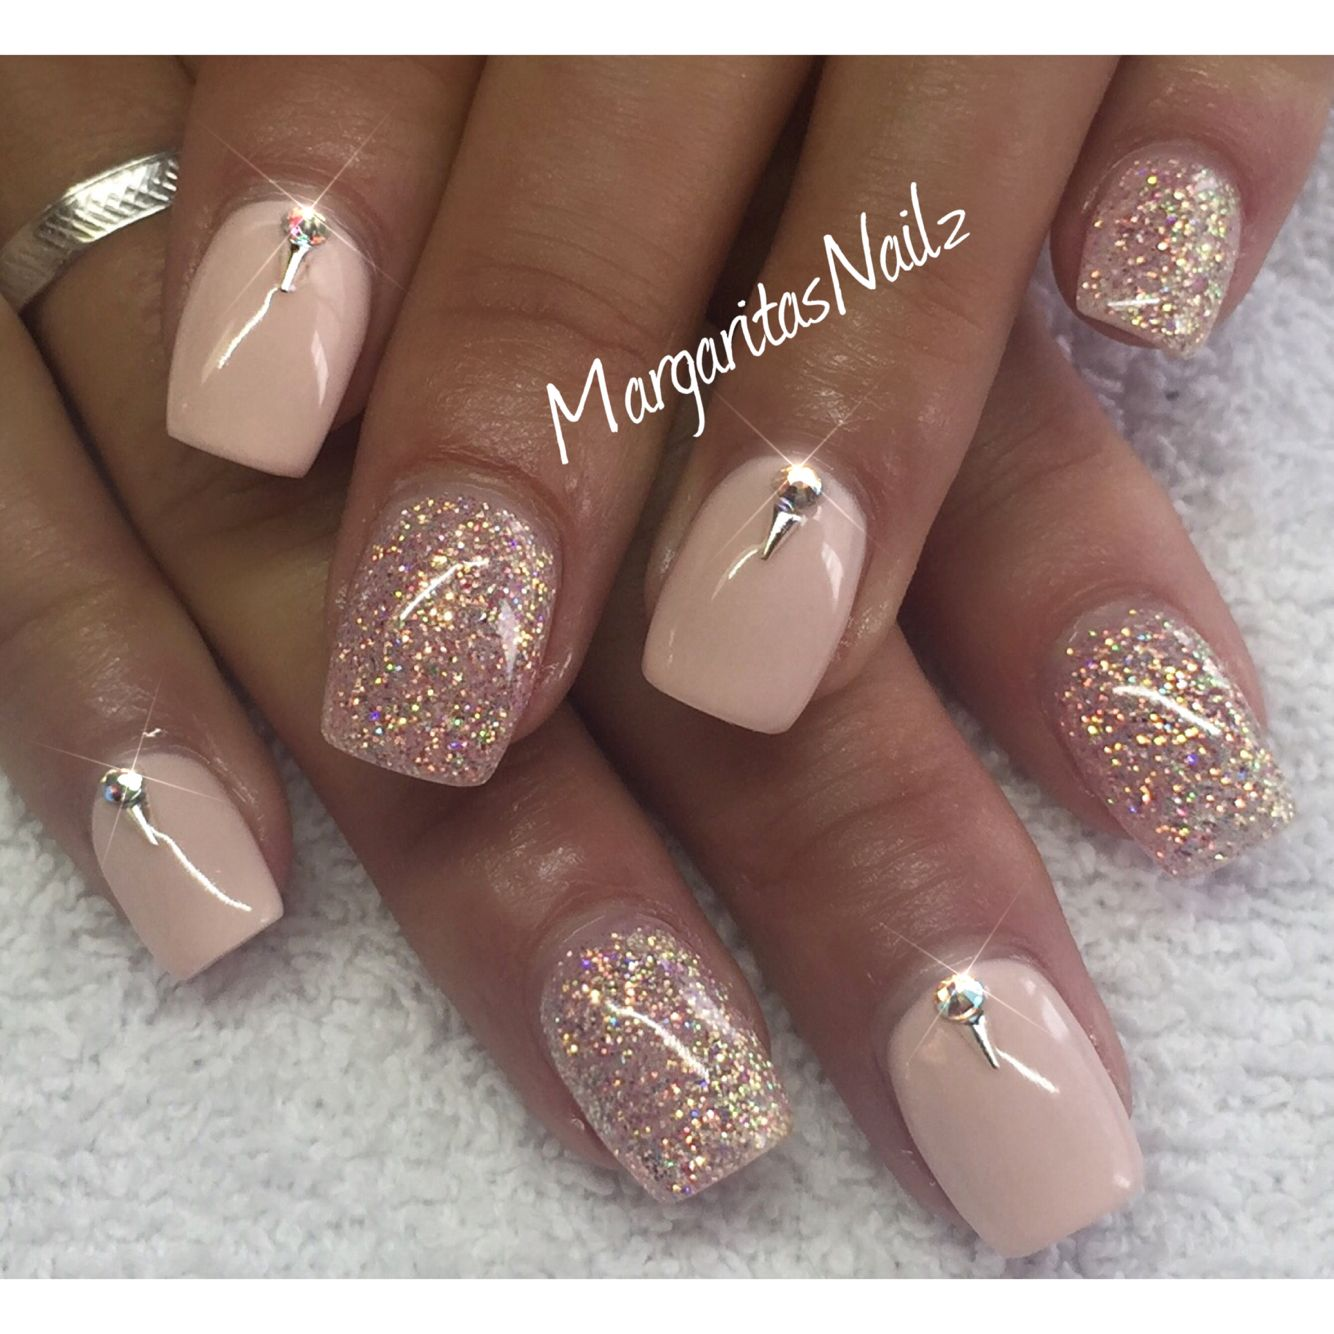 Nude and glitter nails @MargaritasNailz | Nail designs | Pinterest ...